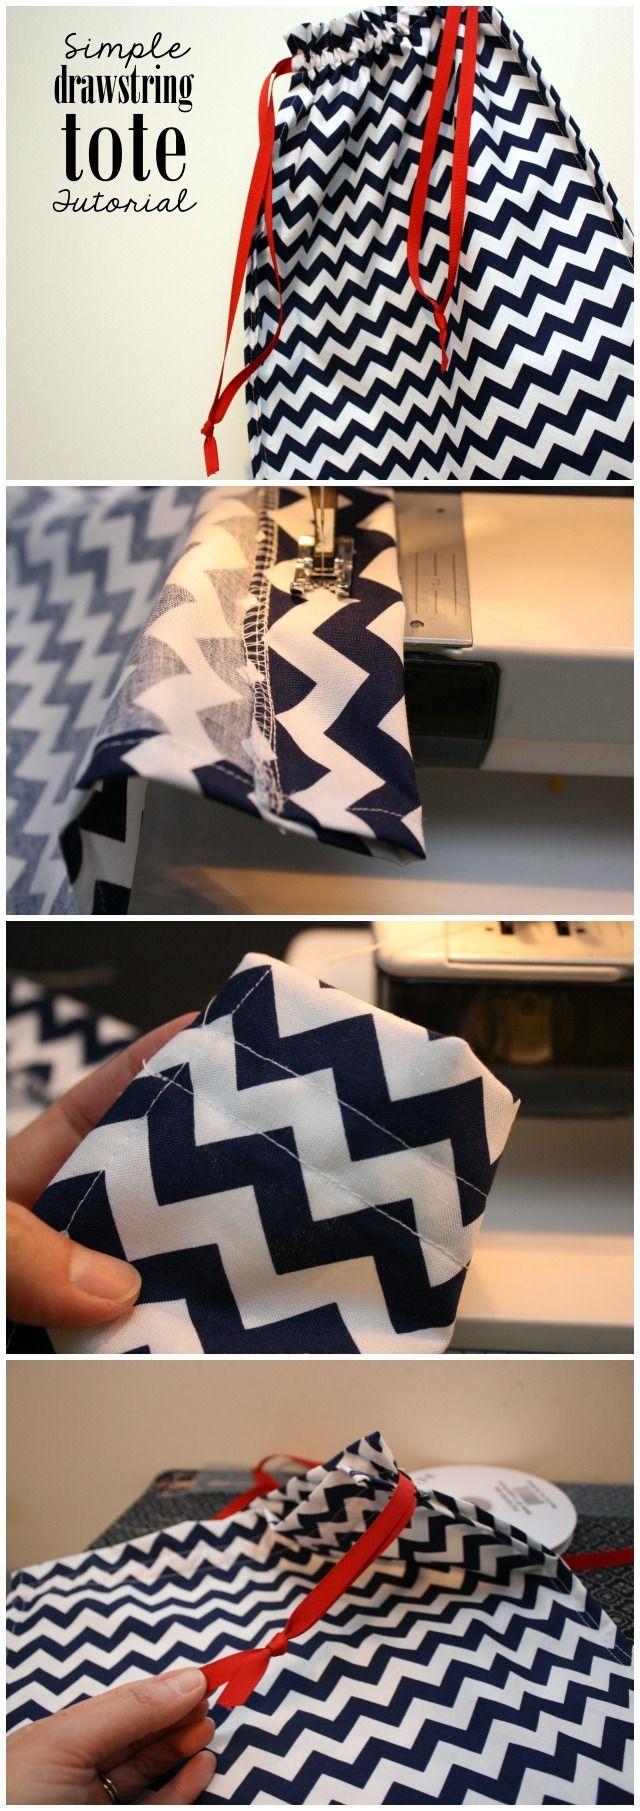 Great beginner sewing project. Easy drawstring tote tutorial - Rae Gun Ramblings